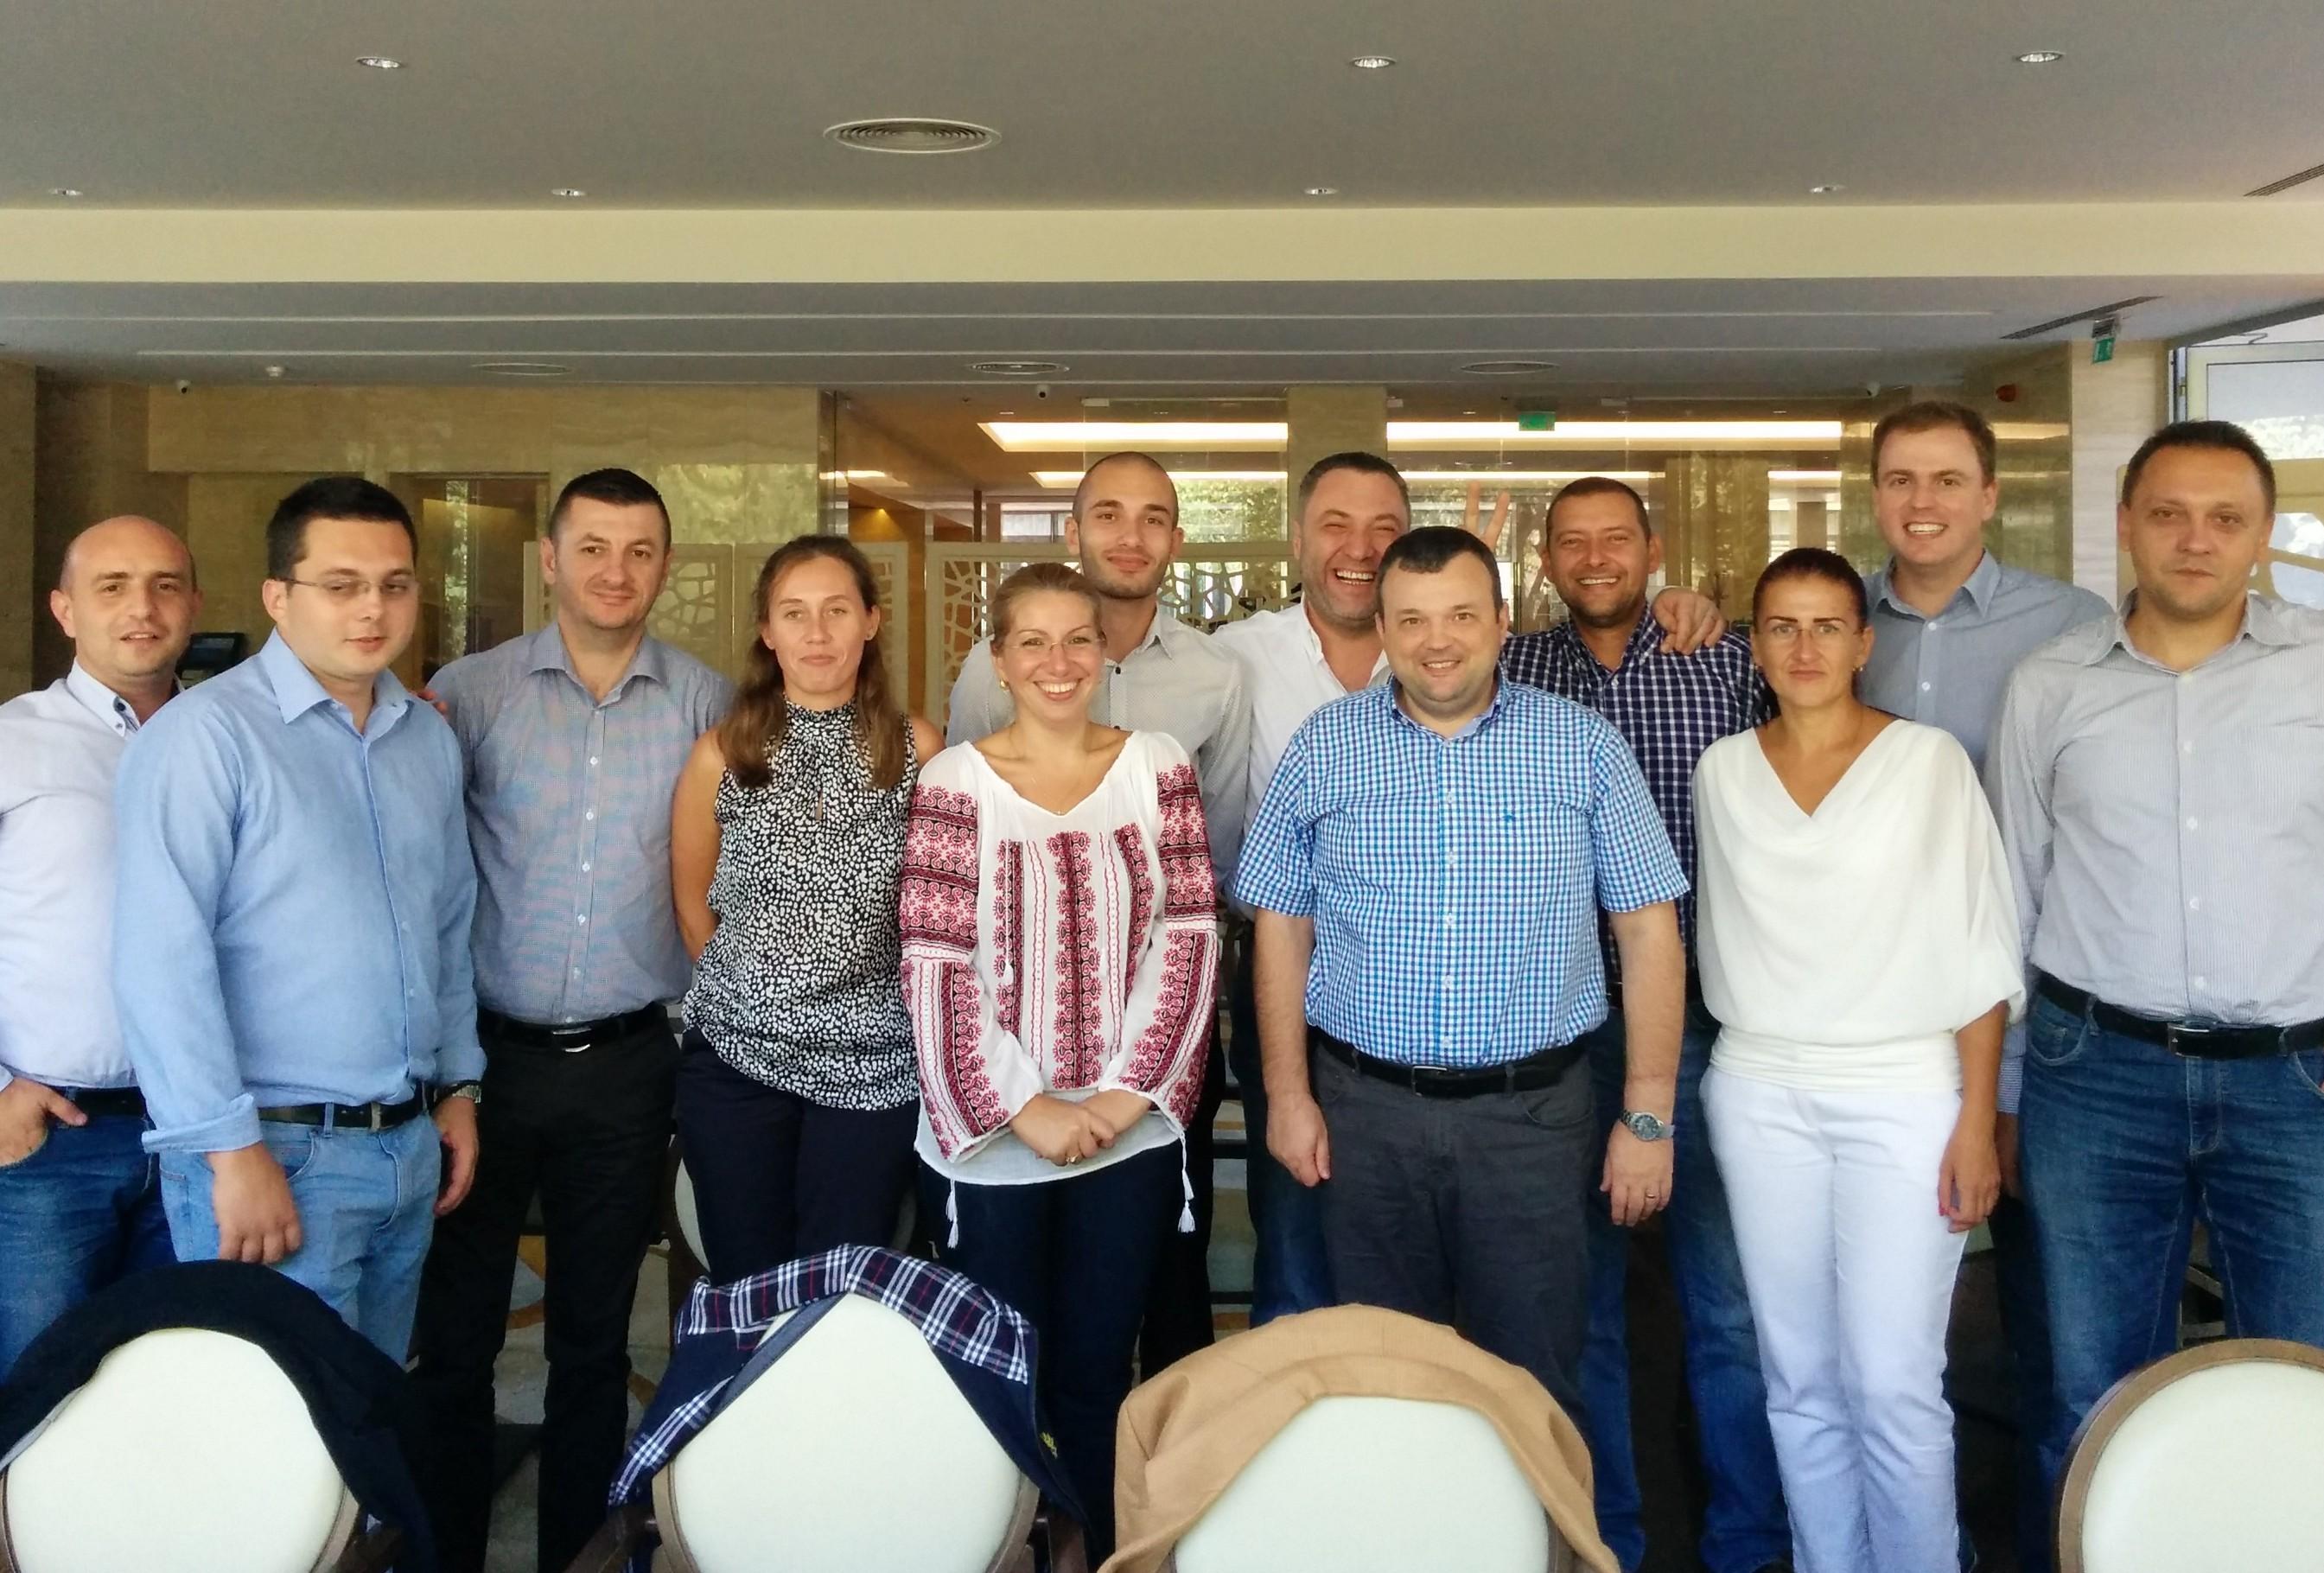 Impreuna cu echipa Pyramis Romania